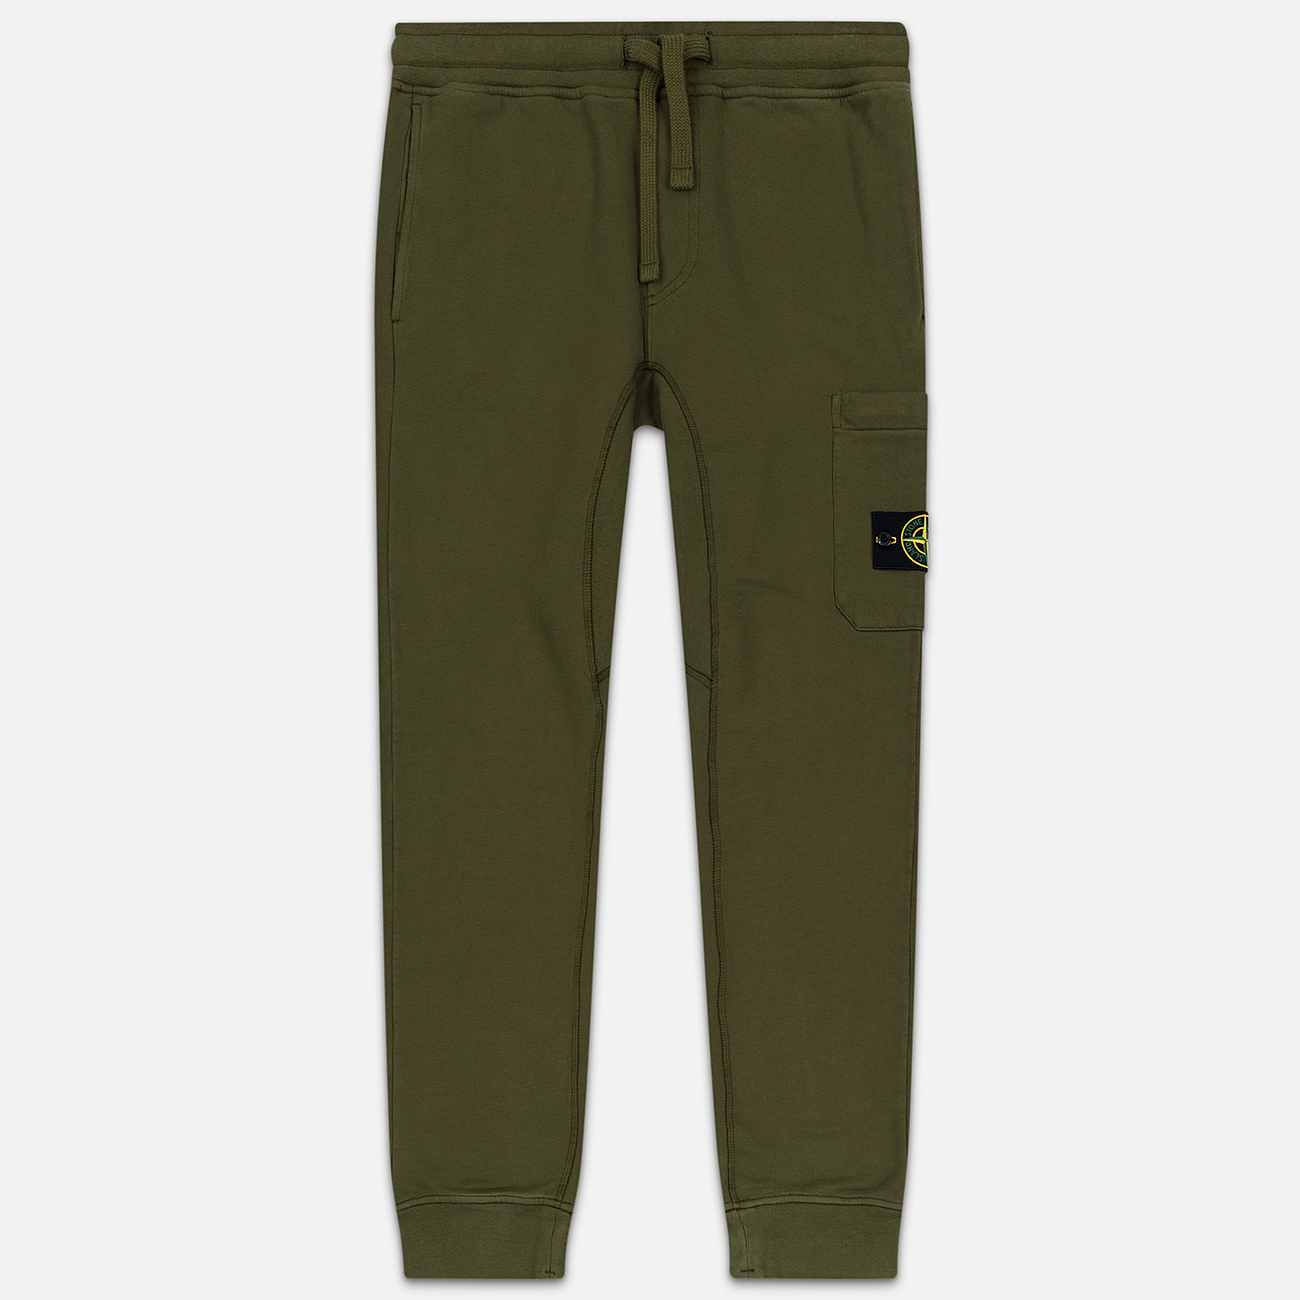 Мужские брюки Stone Island Jogging Large Zip Pocket Olive Green